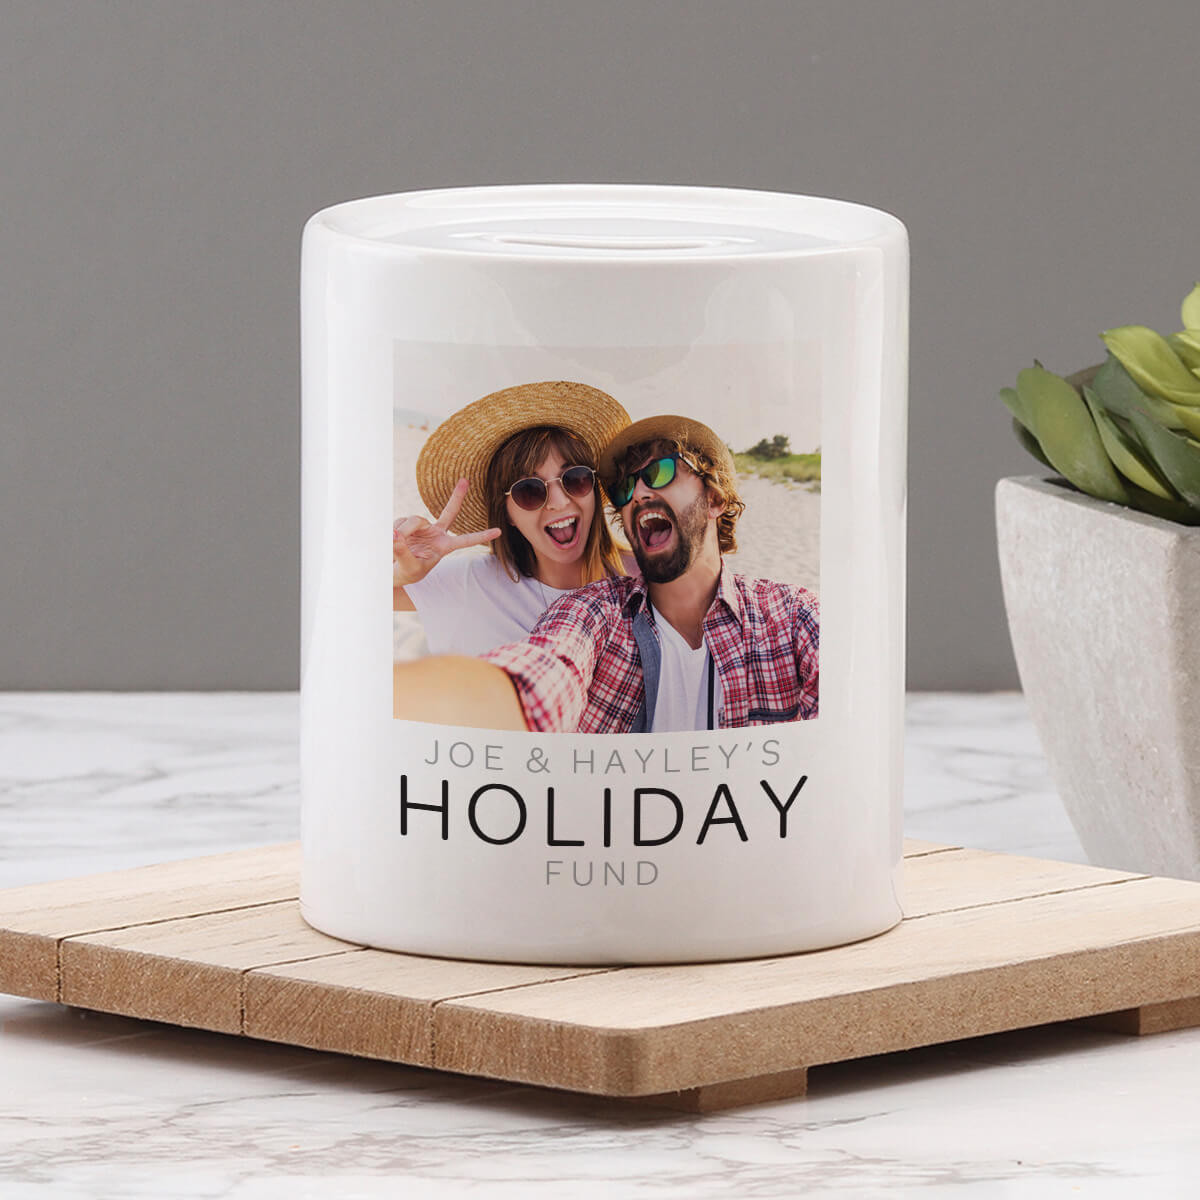 Personalised Holiday Fund Money Box